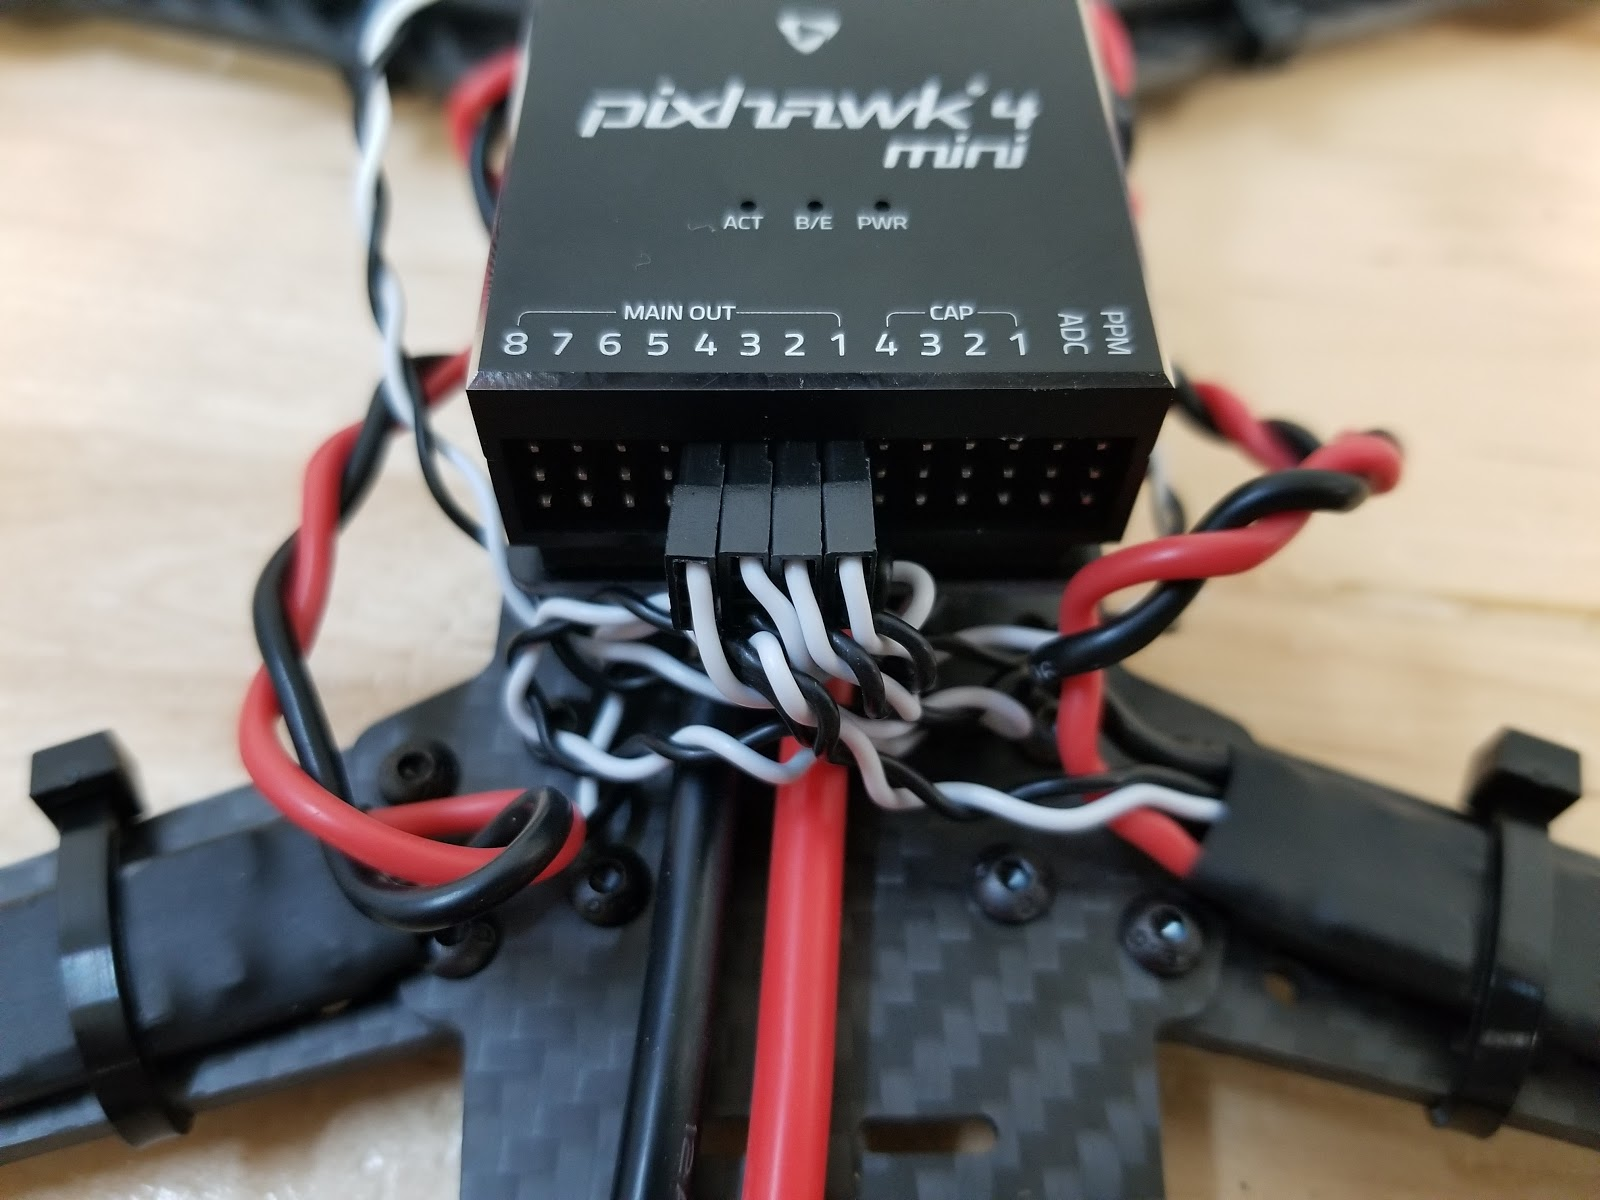 QAV250 (Pixhawk4 Mini) · PX4 v1 9 0 User Guide